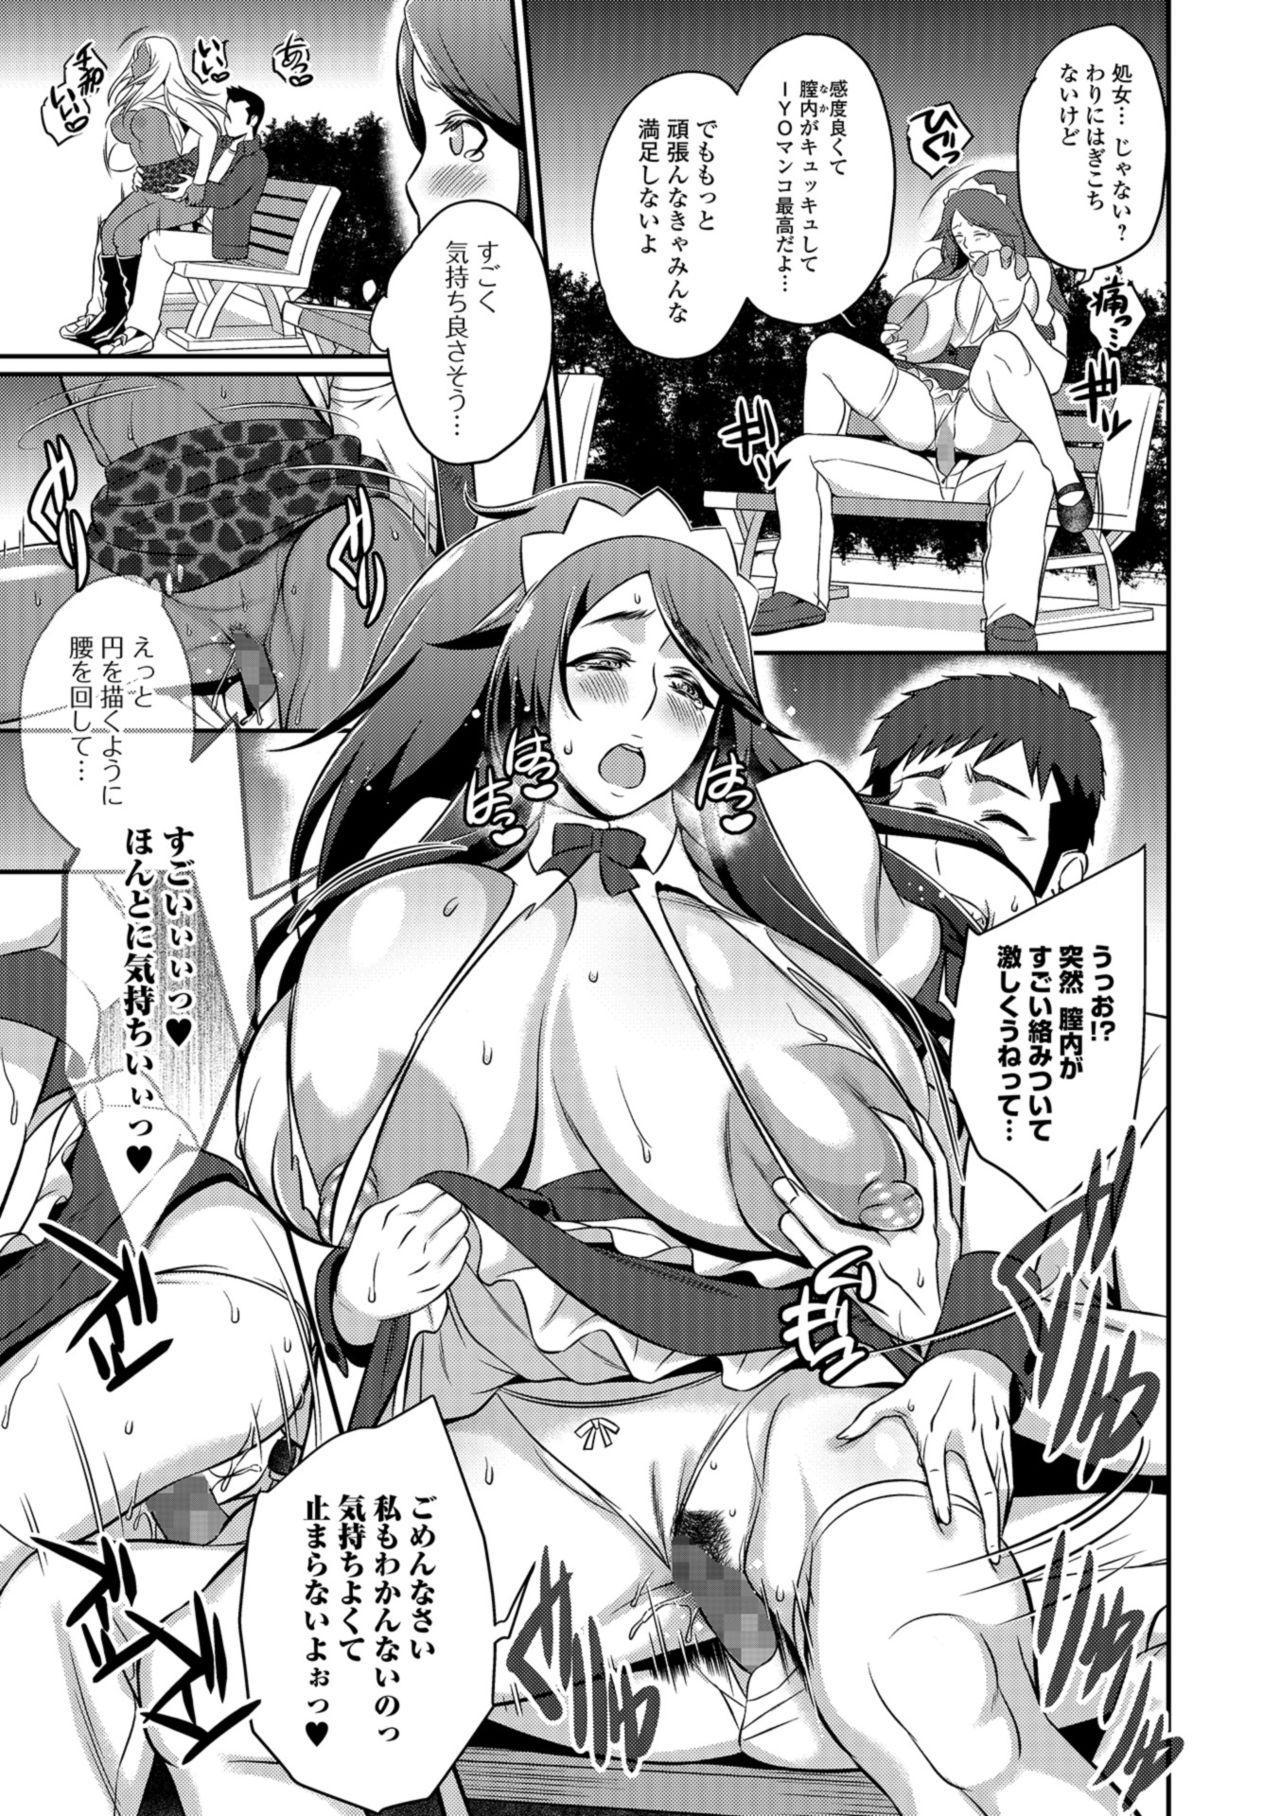 COMIC Shigekiteki SQUIRT!! Vol. 09 226